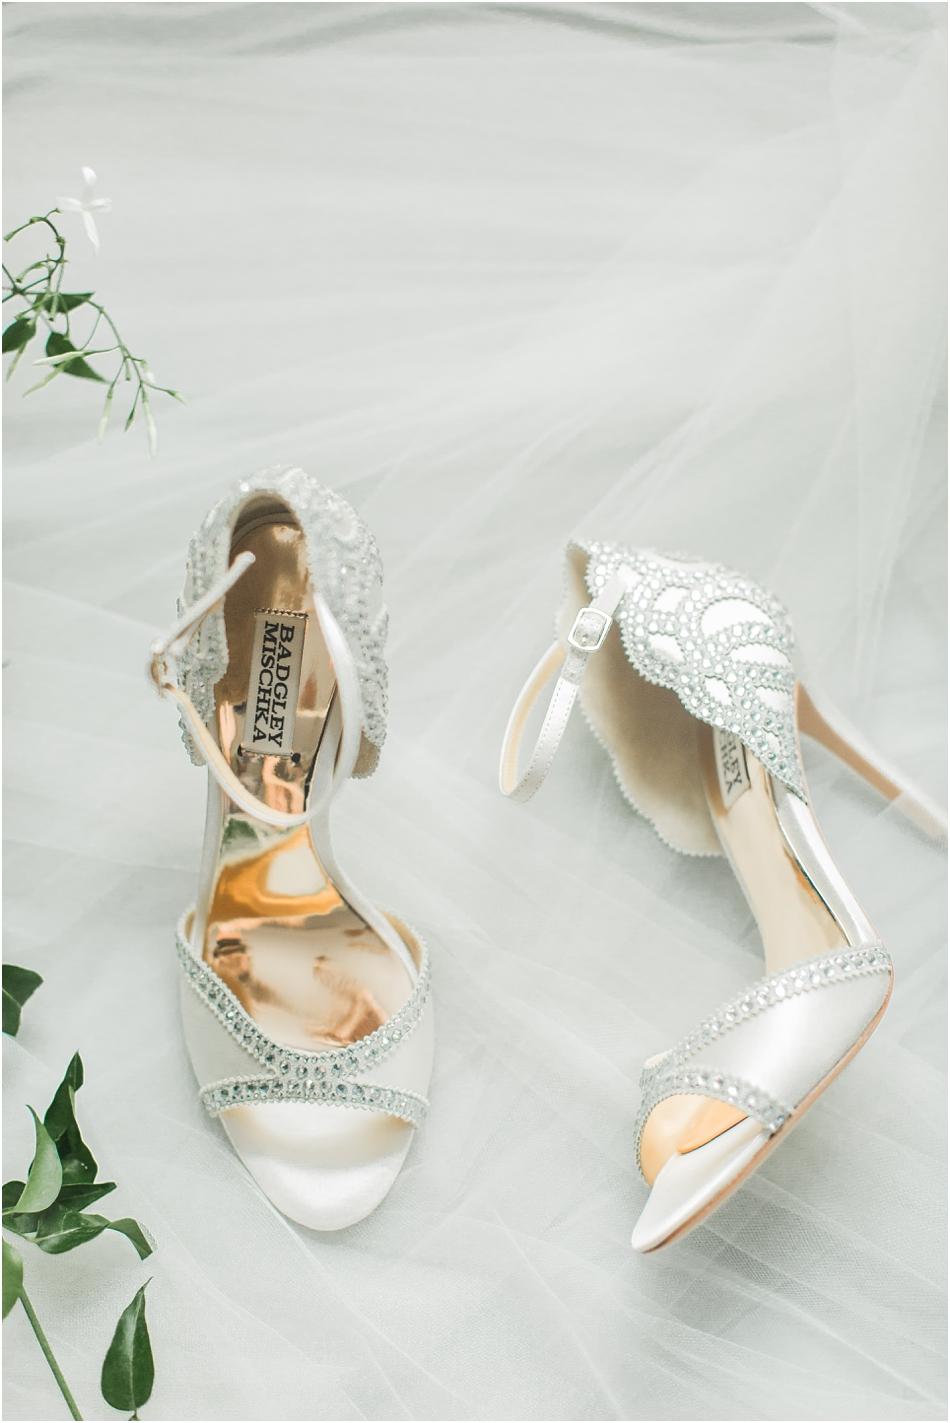 brunch_style_me_pretty_dennis_inn__always_yours_events_wild_dahlia_massachusetts_cape_cod_new_england_wedding_photographer_Meredith_Jane_Photography_photo_2101.jpg